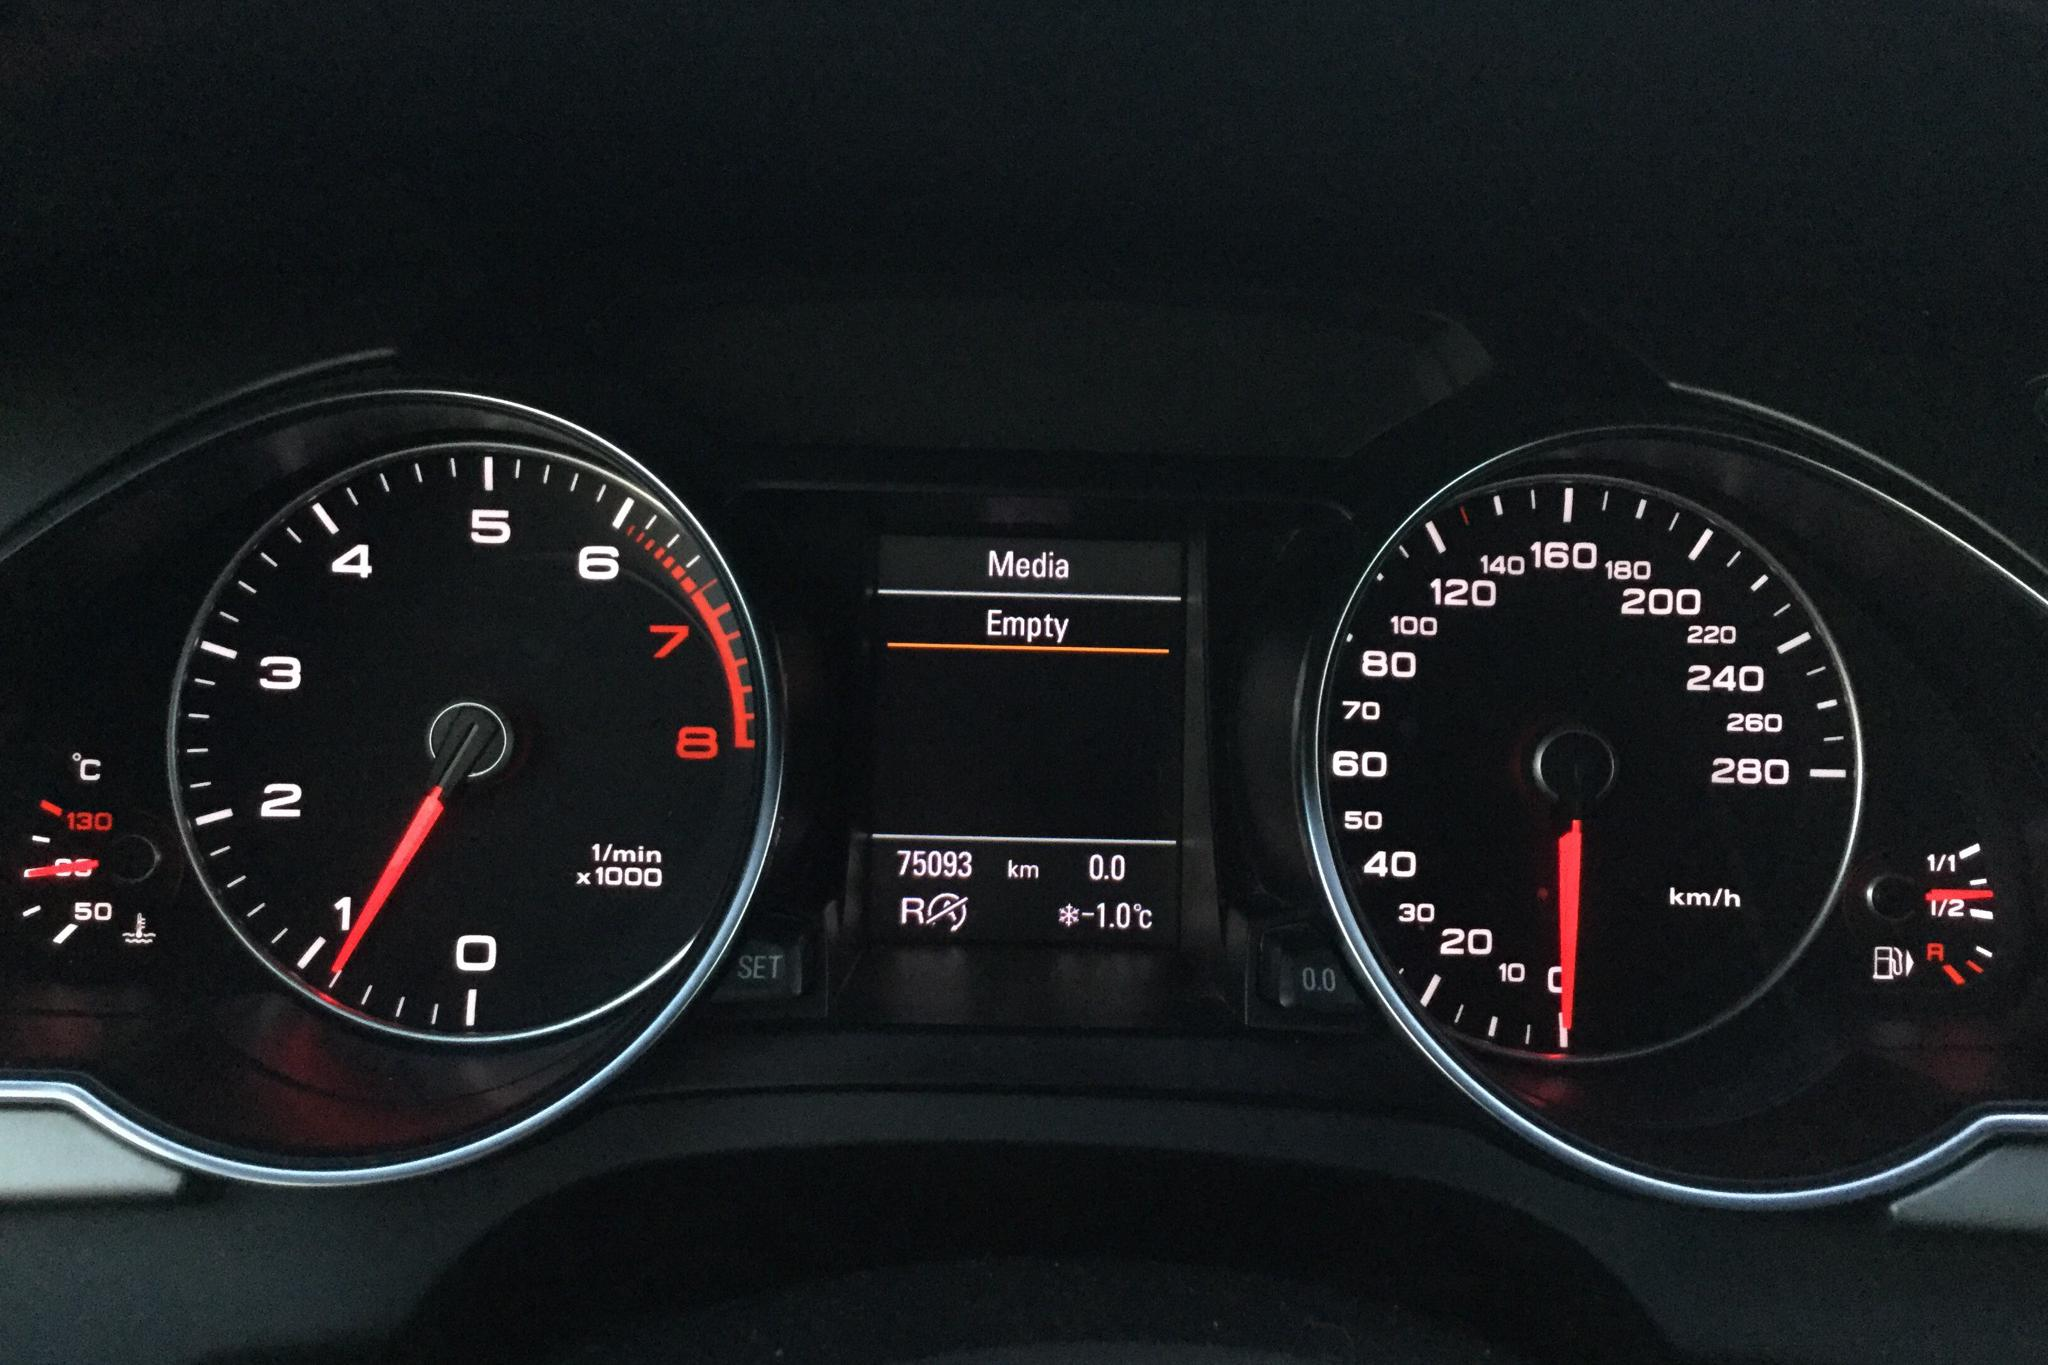 Audi A5 2.0 TFSI Cabriolet quattro (211hk) - 7 509 mil - Automat - röd - 2012